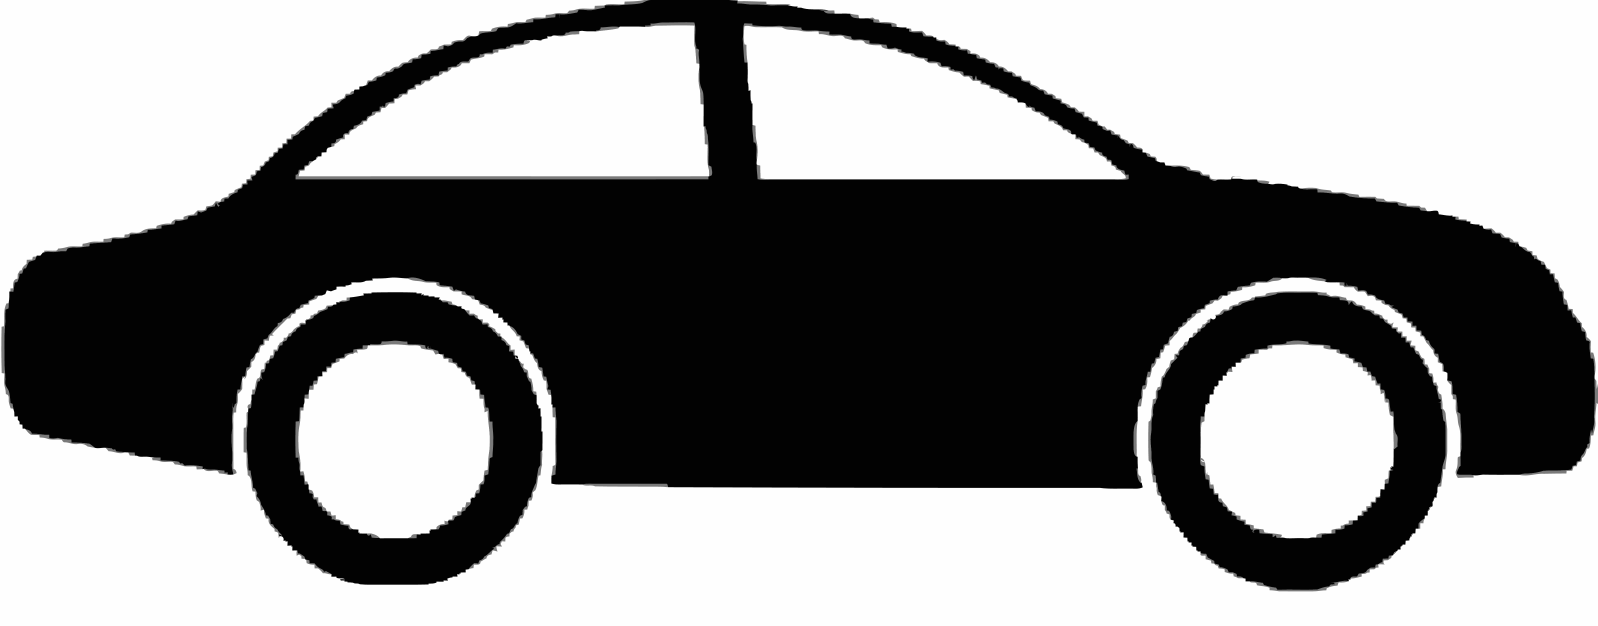 1598x626 Clip Art Cartoon Car Image